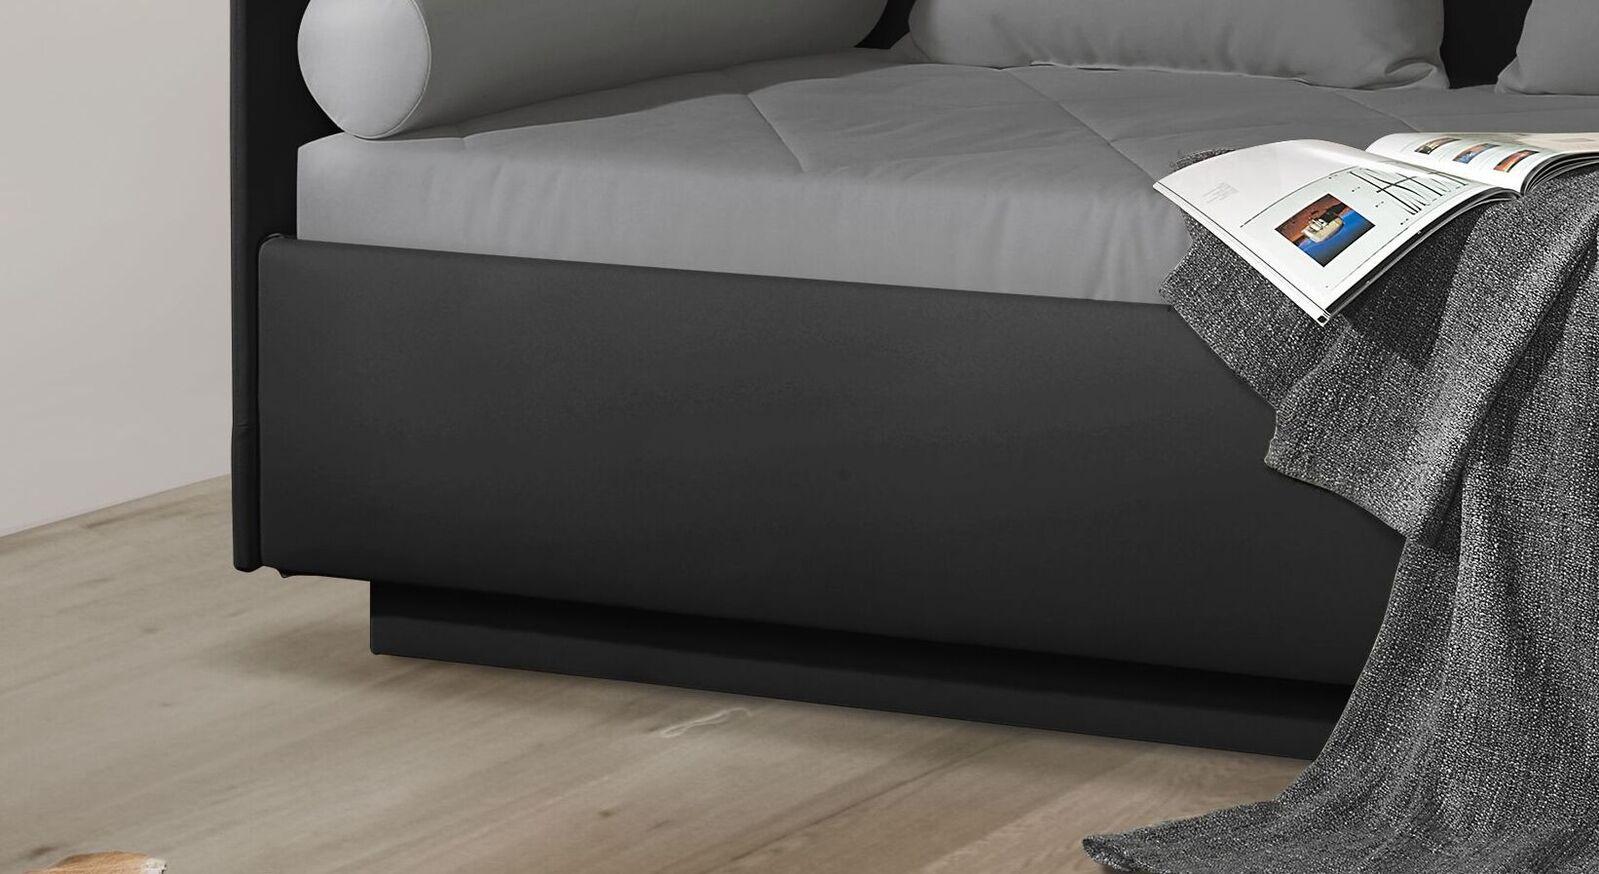 Schlafsofa Eriko Komfort mit niedrigem Sockel